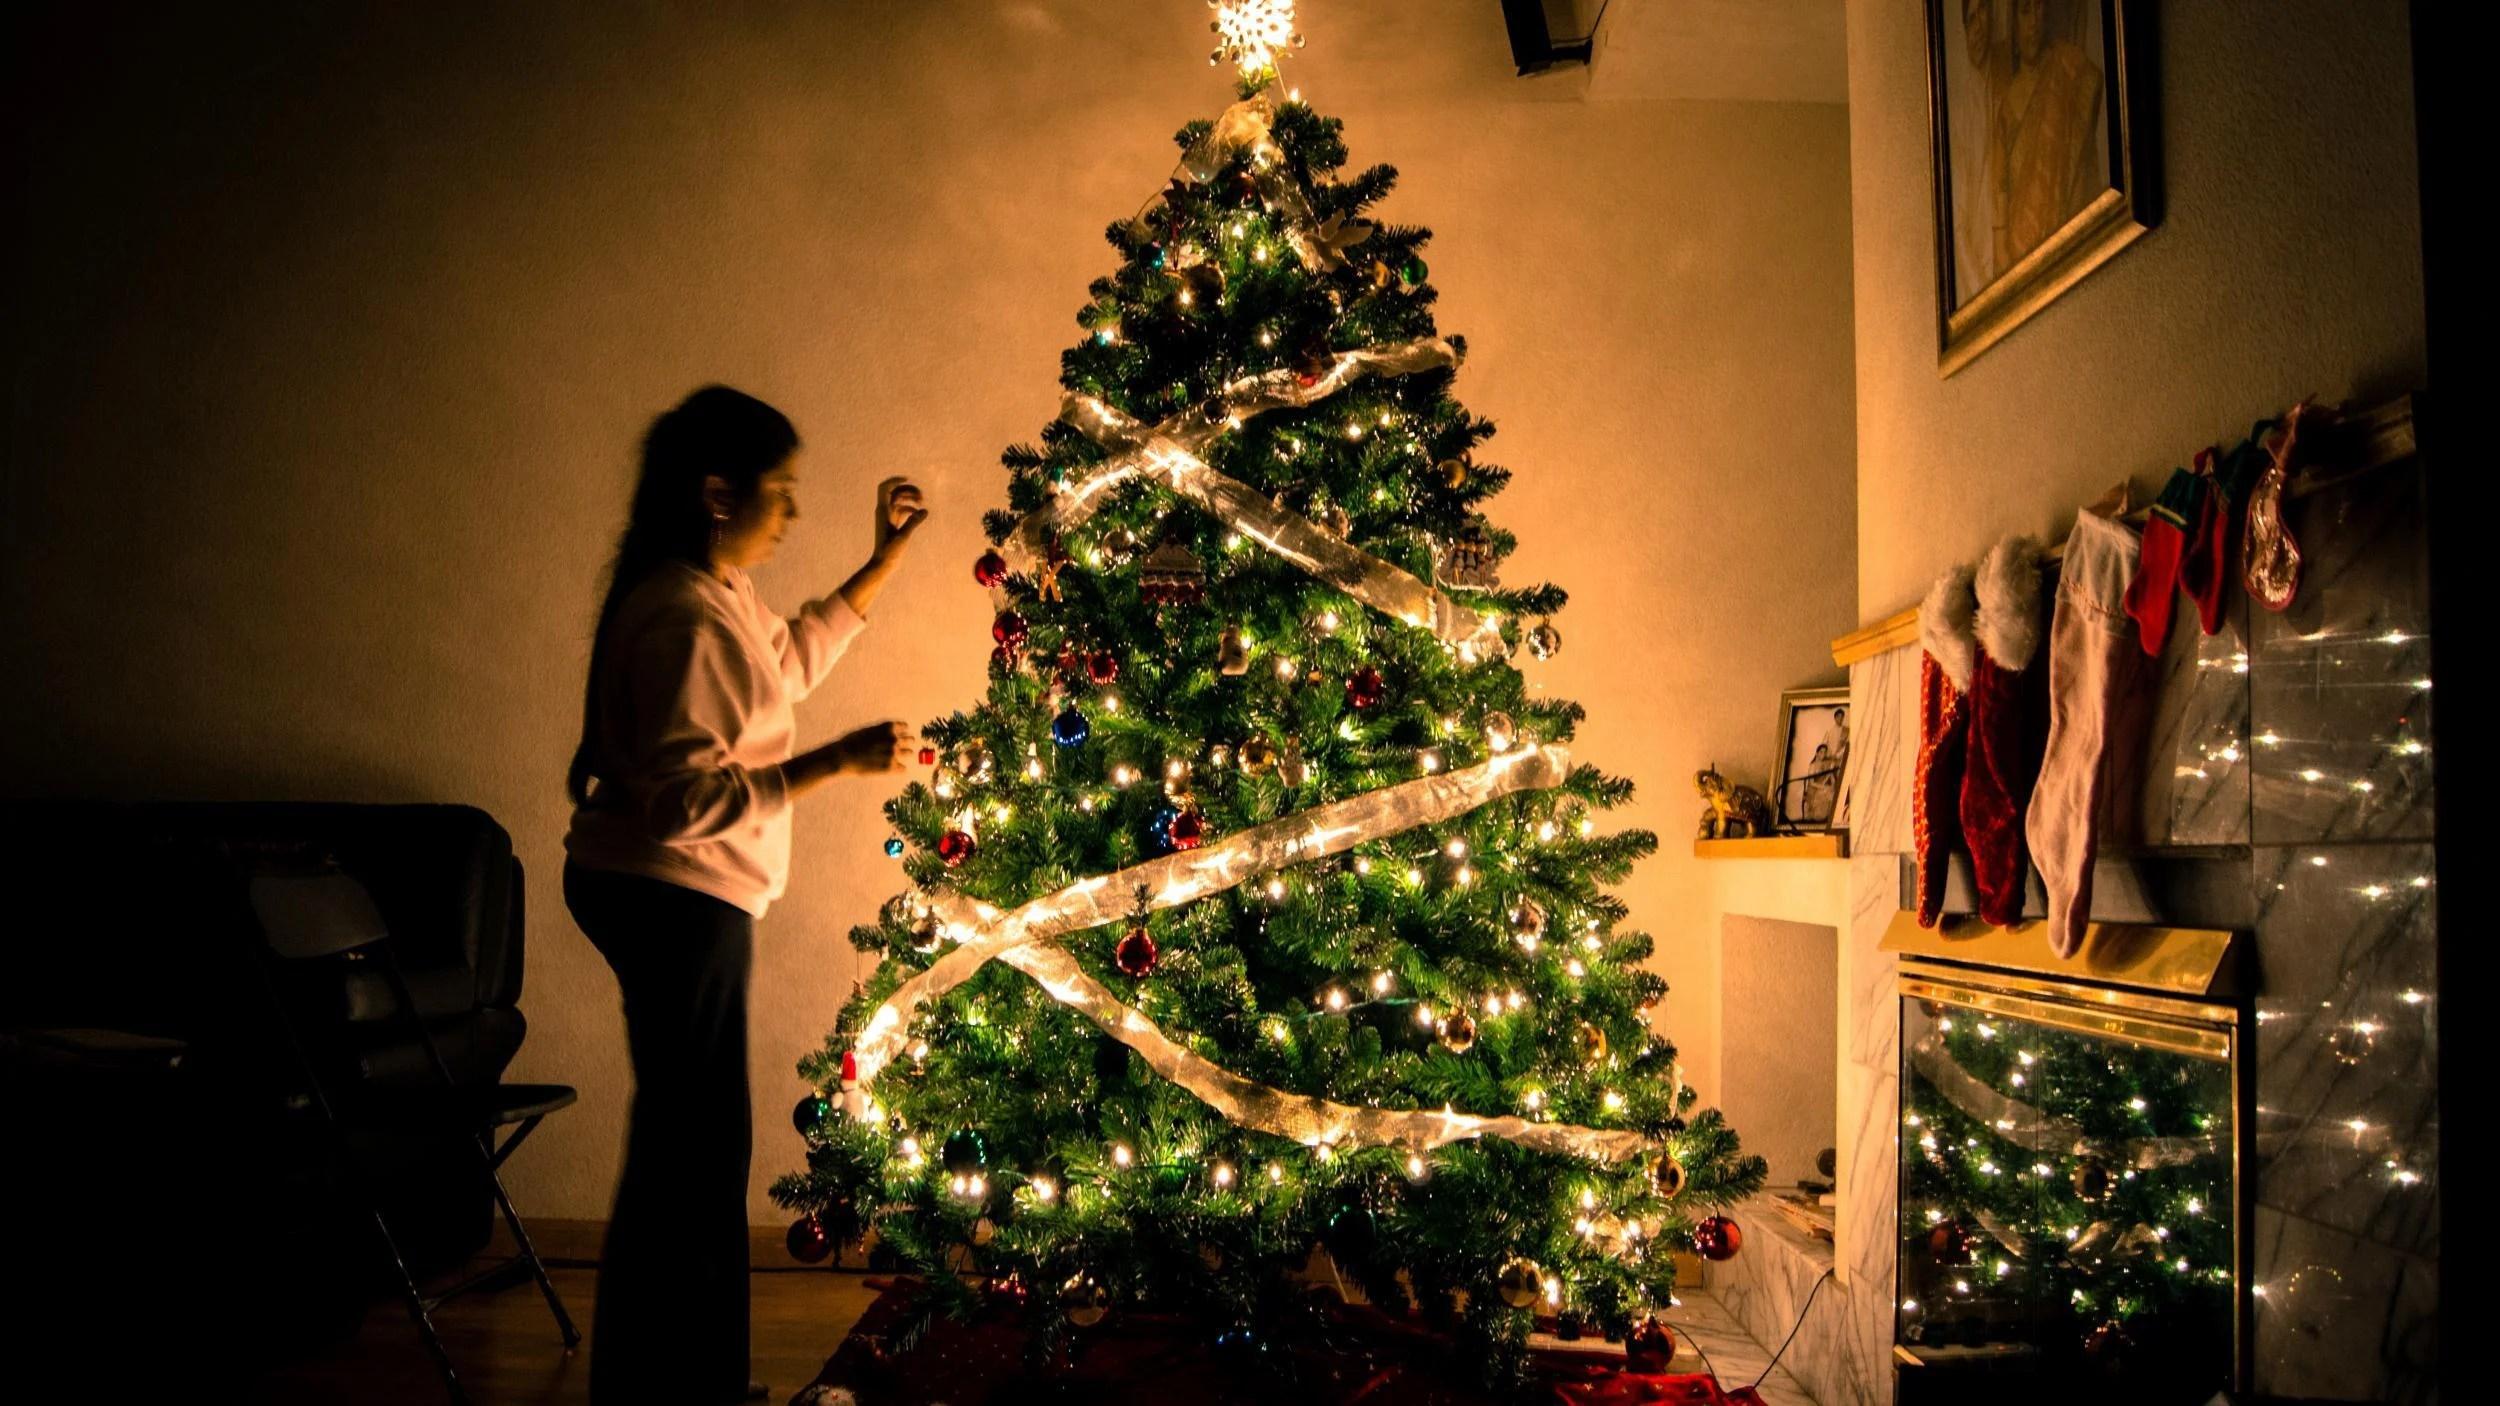 How To Correctly Dress Christmas Tree Lights, According To